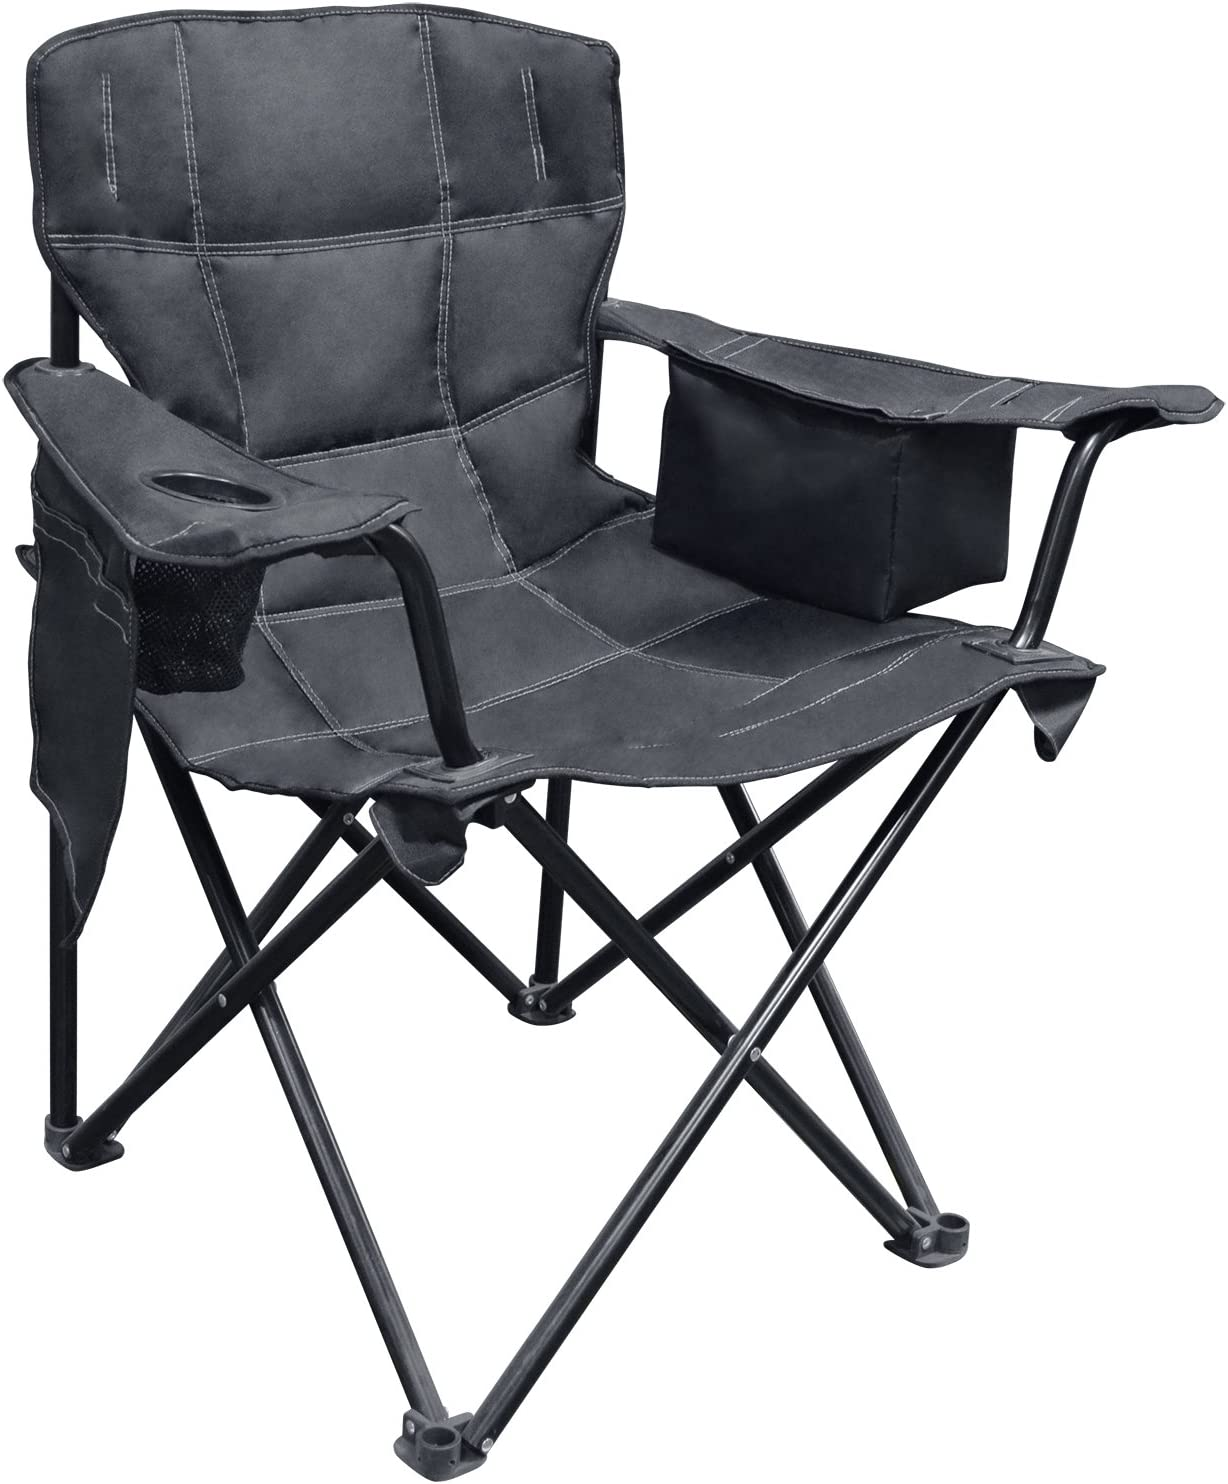 Amazon Com Caravan Sports Eqc01051 Solid Black Elite Quad Chair Garden Outdoor